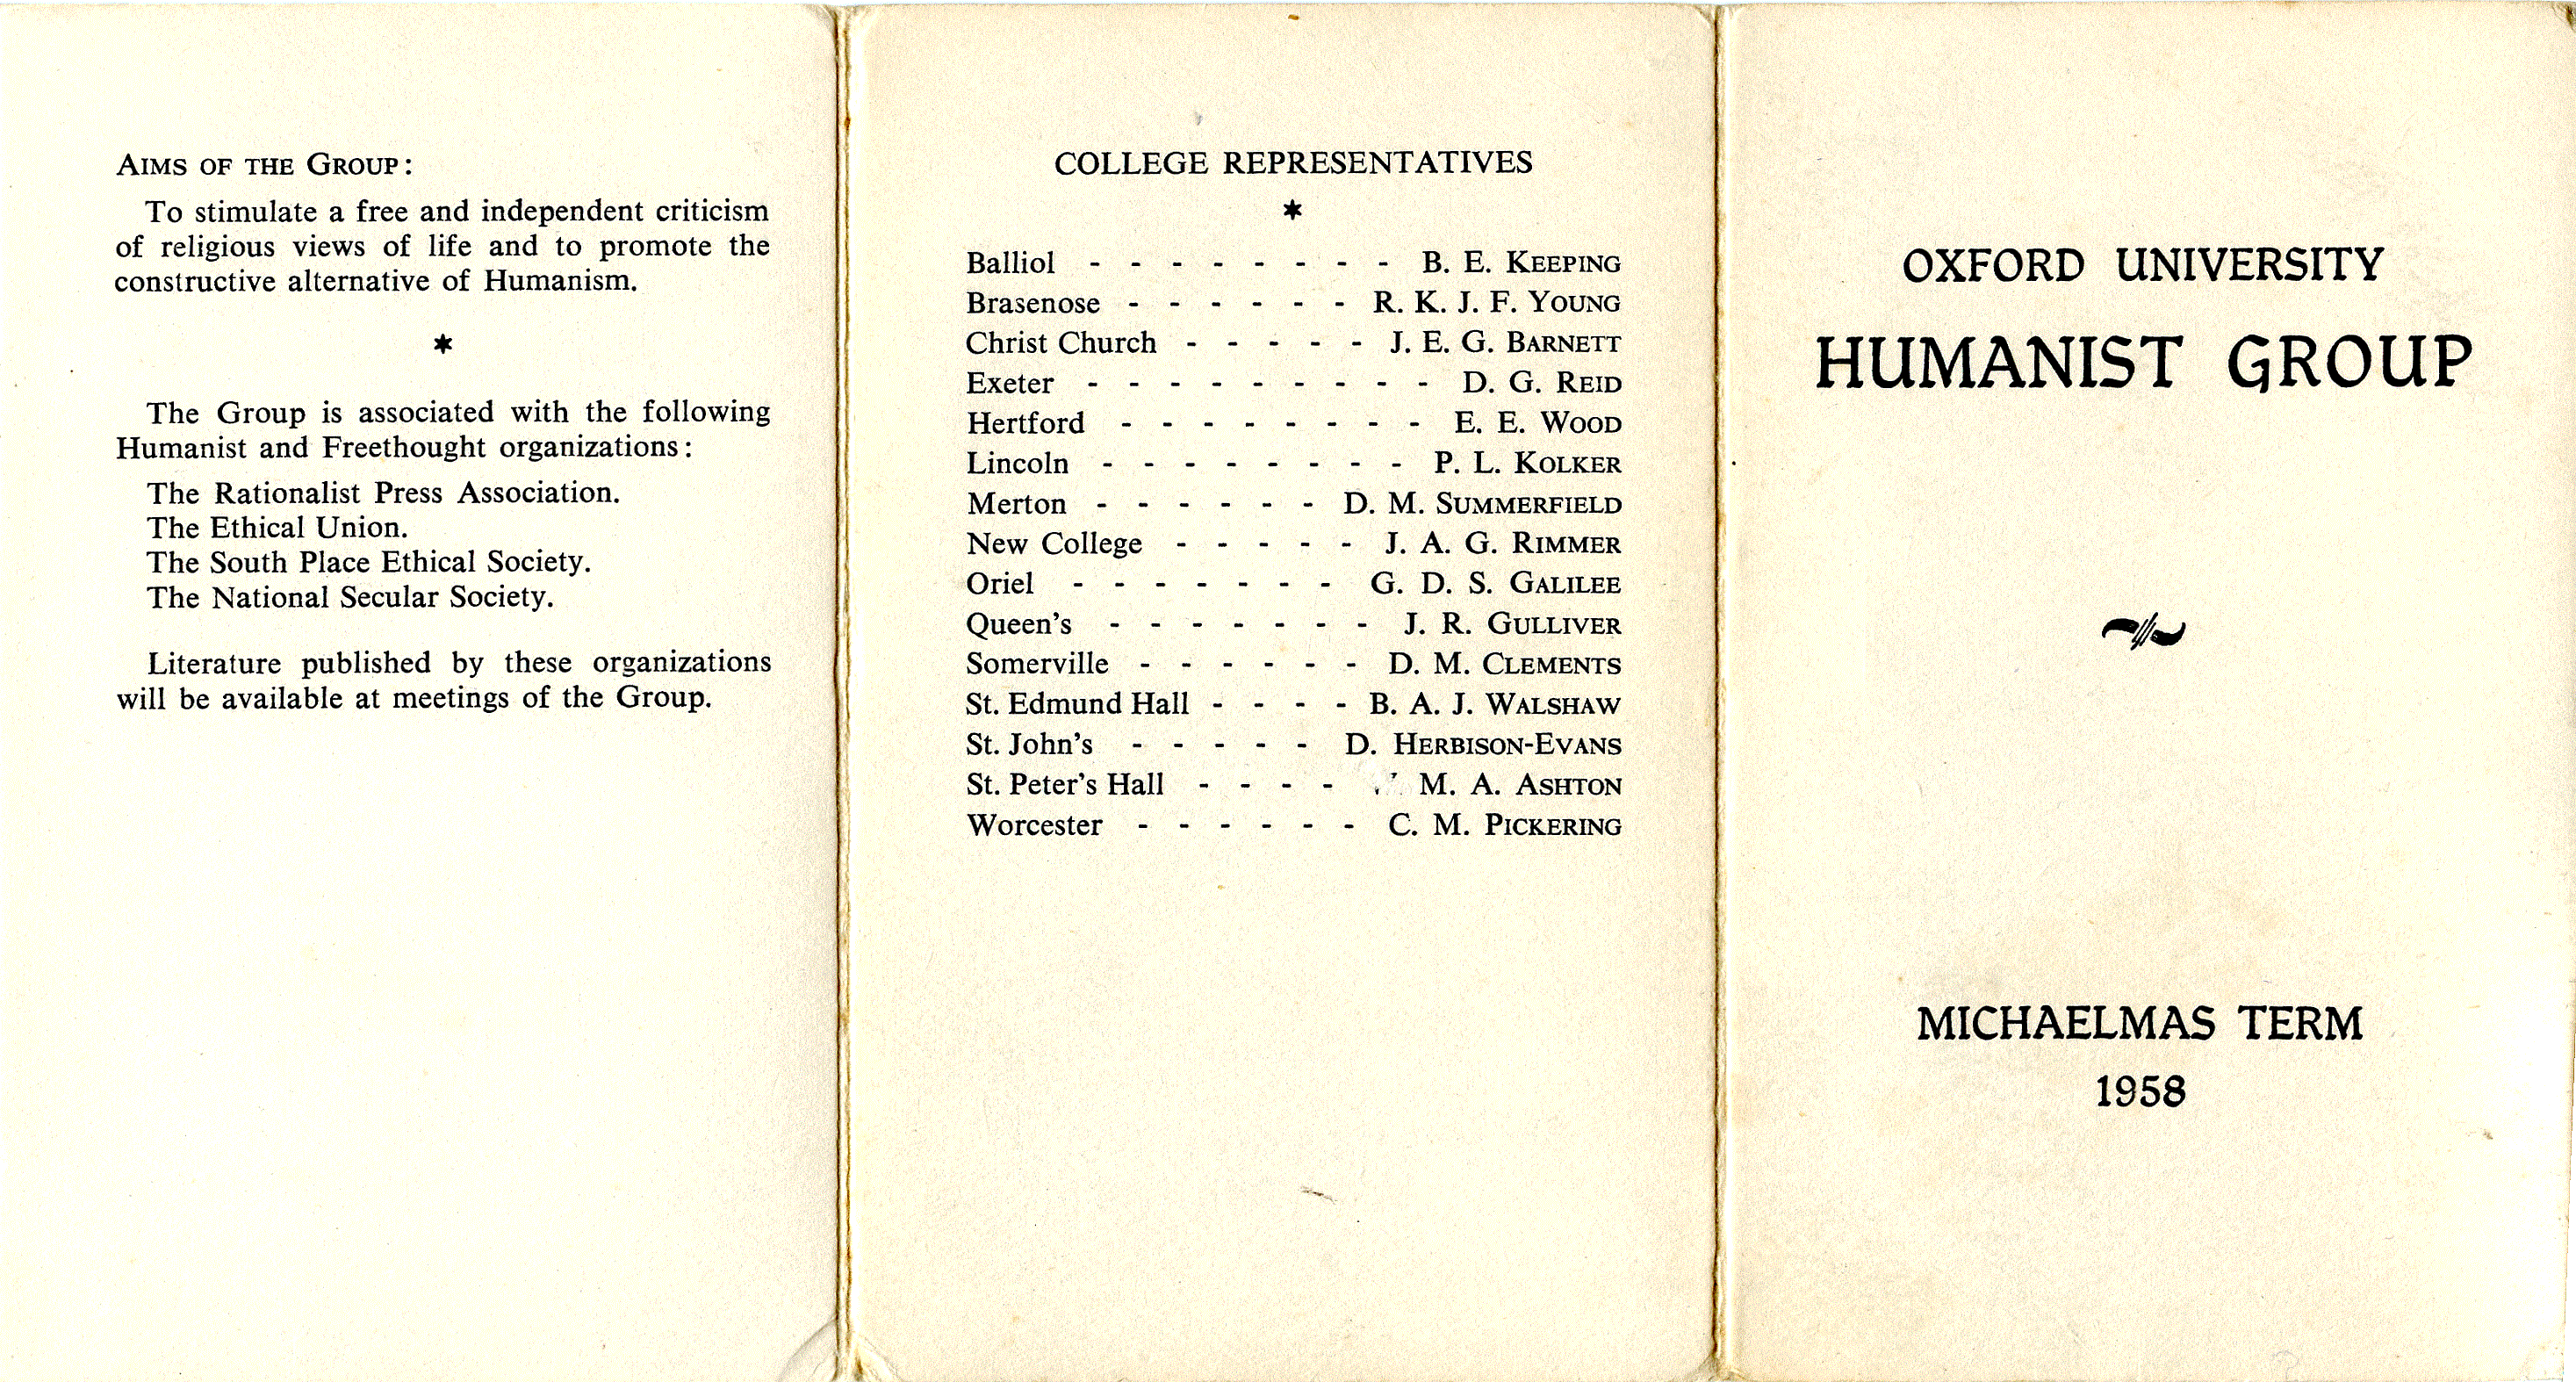 michaelmas-1958-a